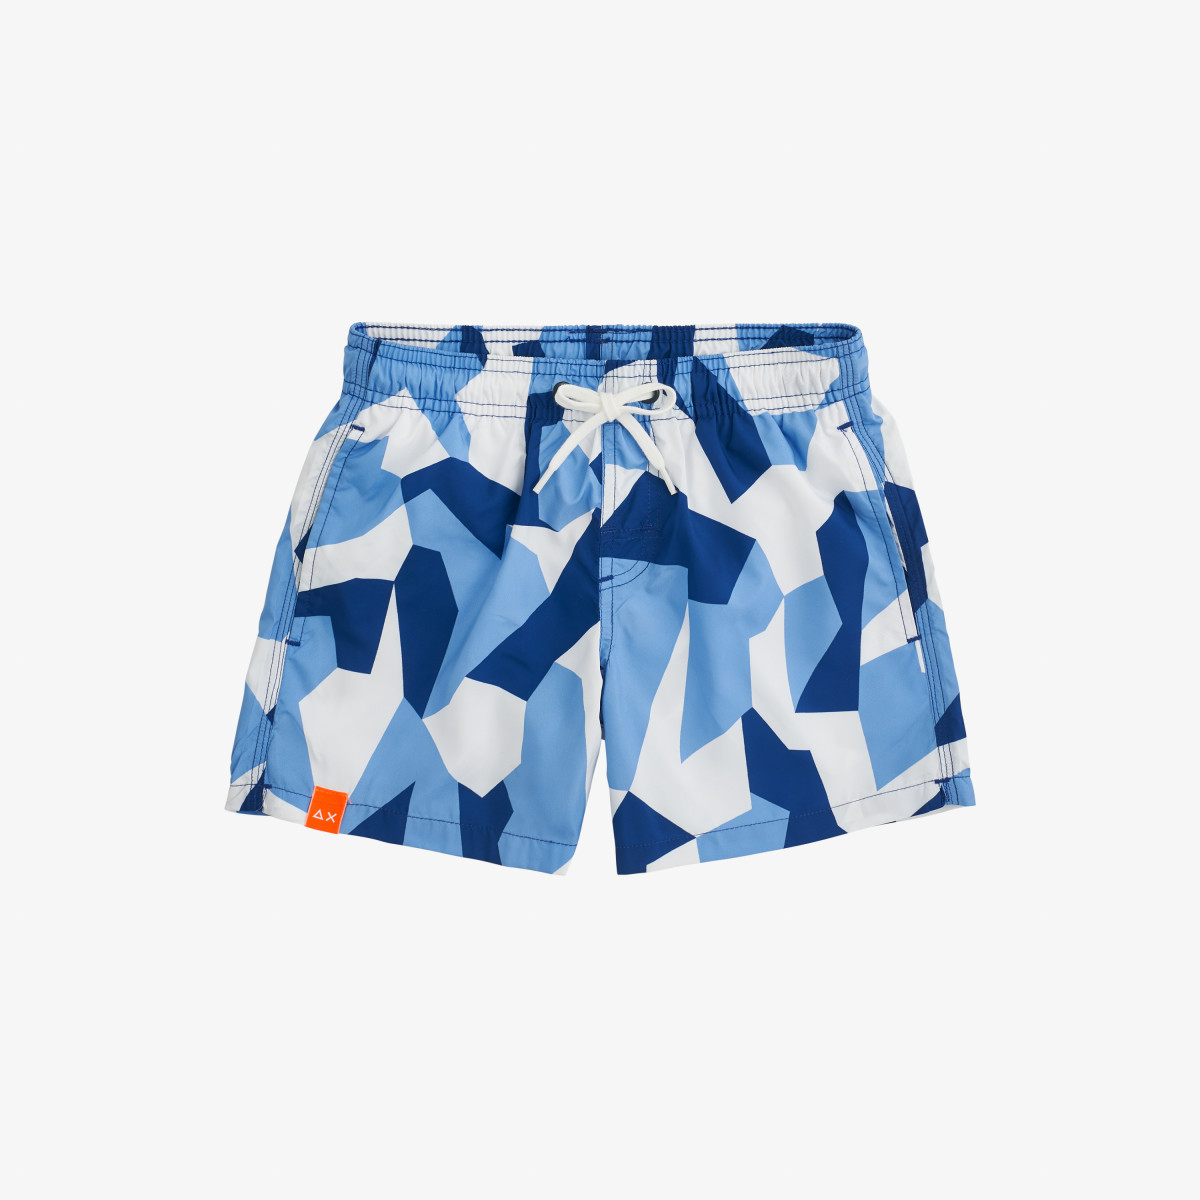 BOY'S SWIM PANT GEOMETRIC AVIO/NAVY BLUE